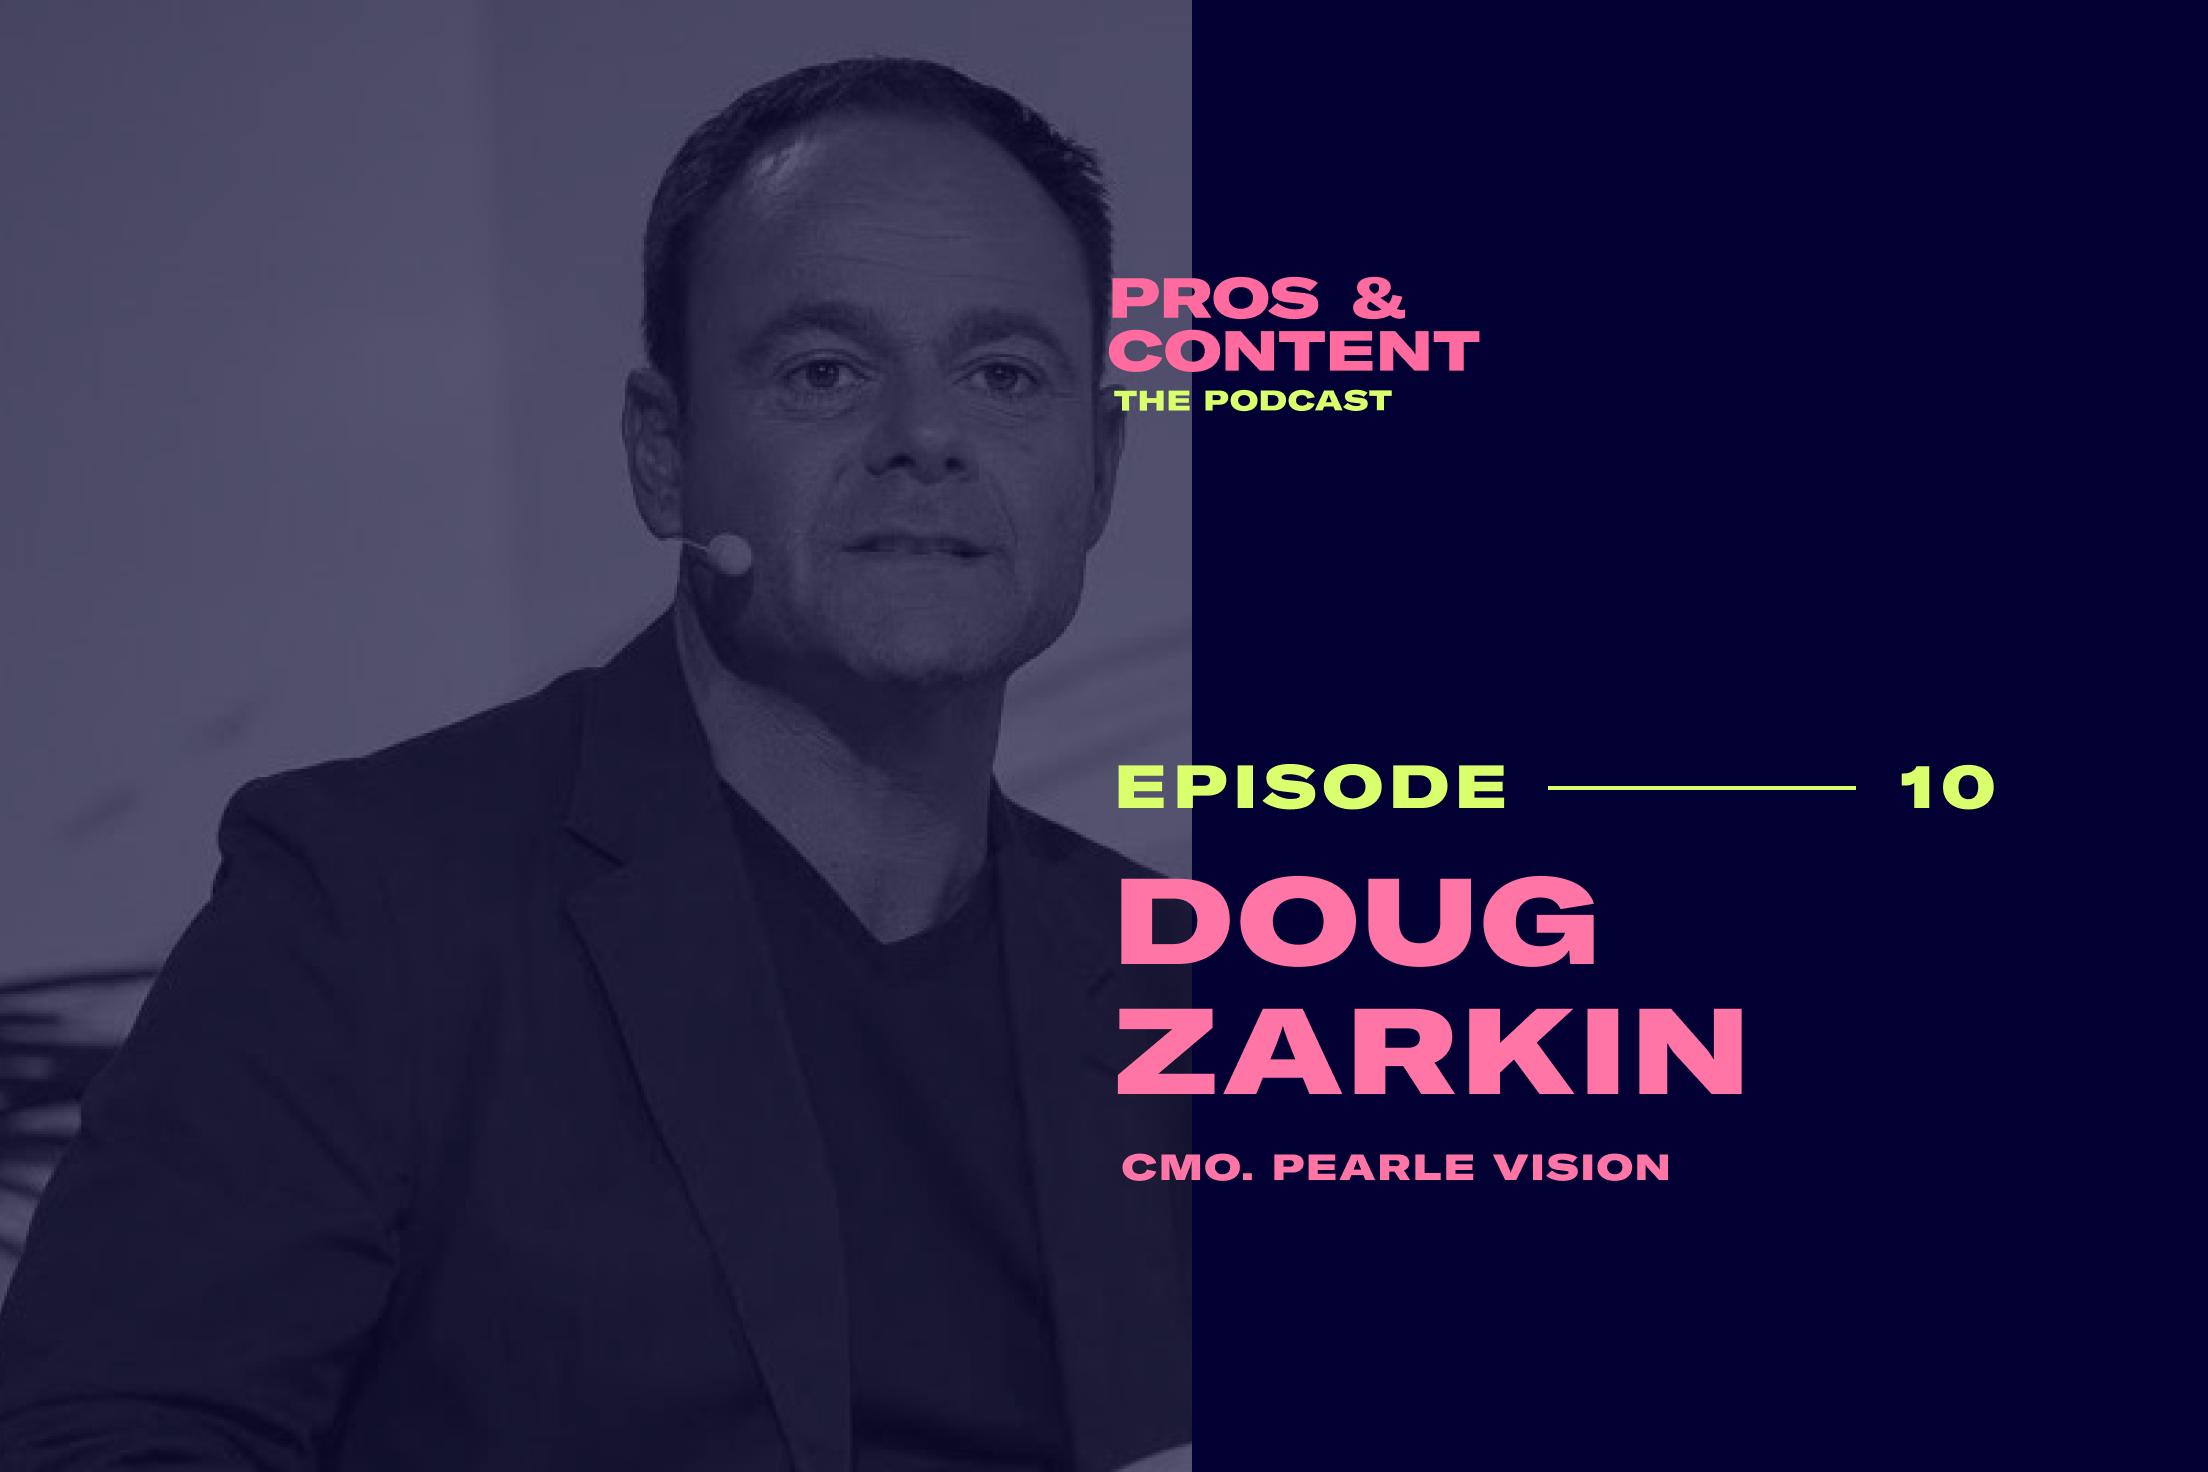 Pros & Content Podcast: Doug Zarkin